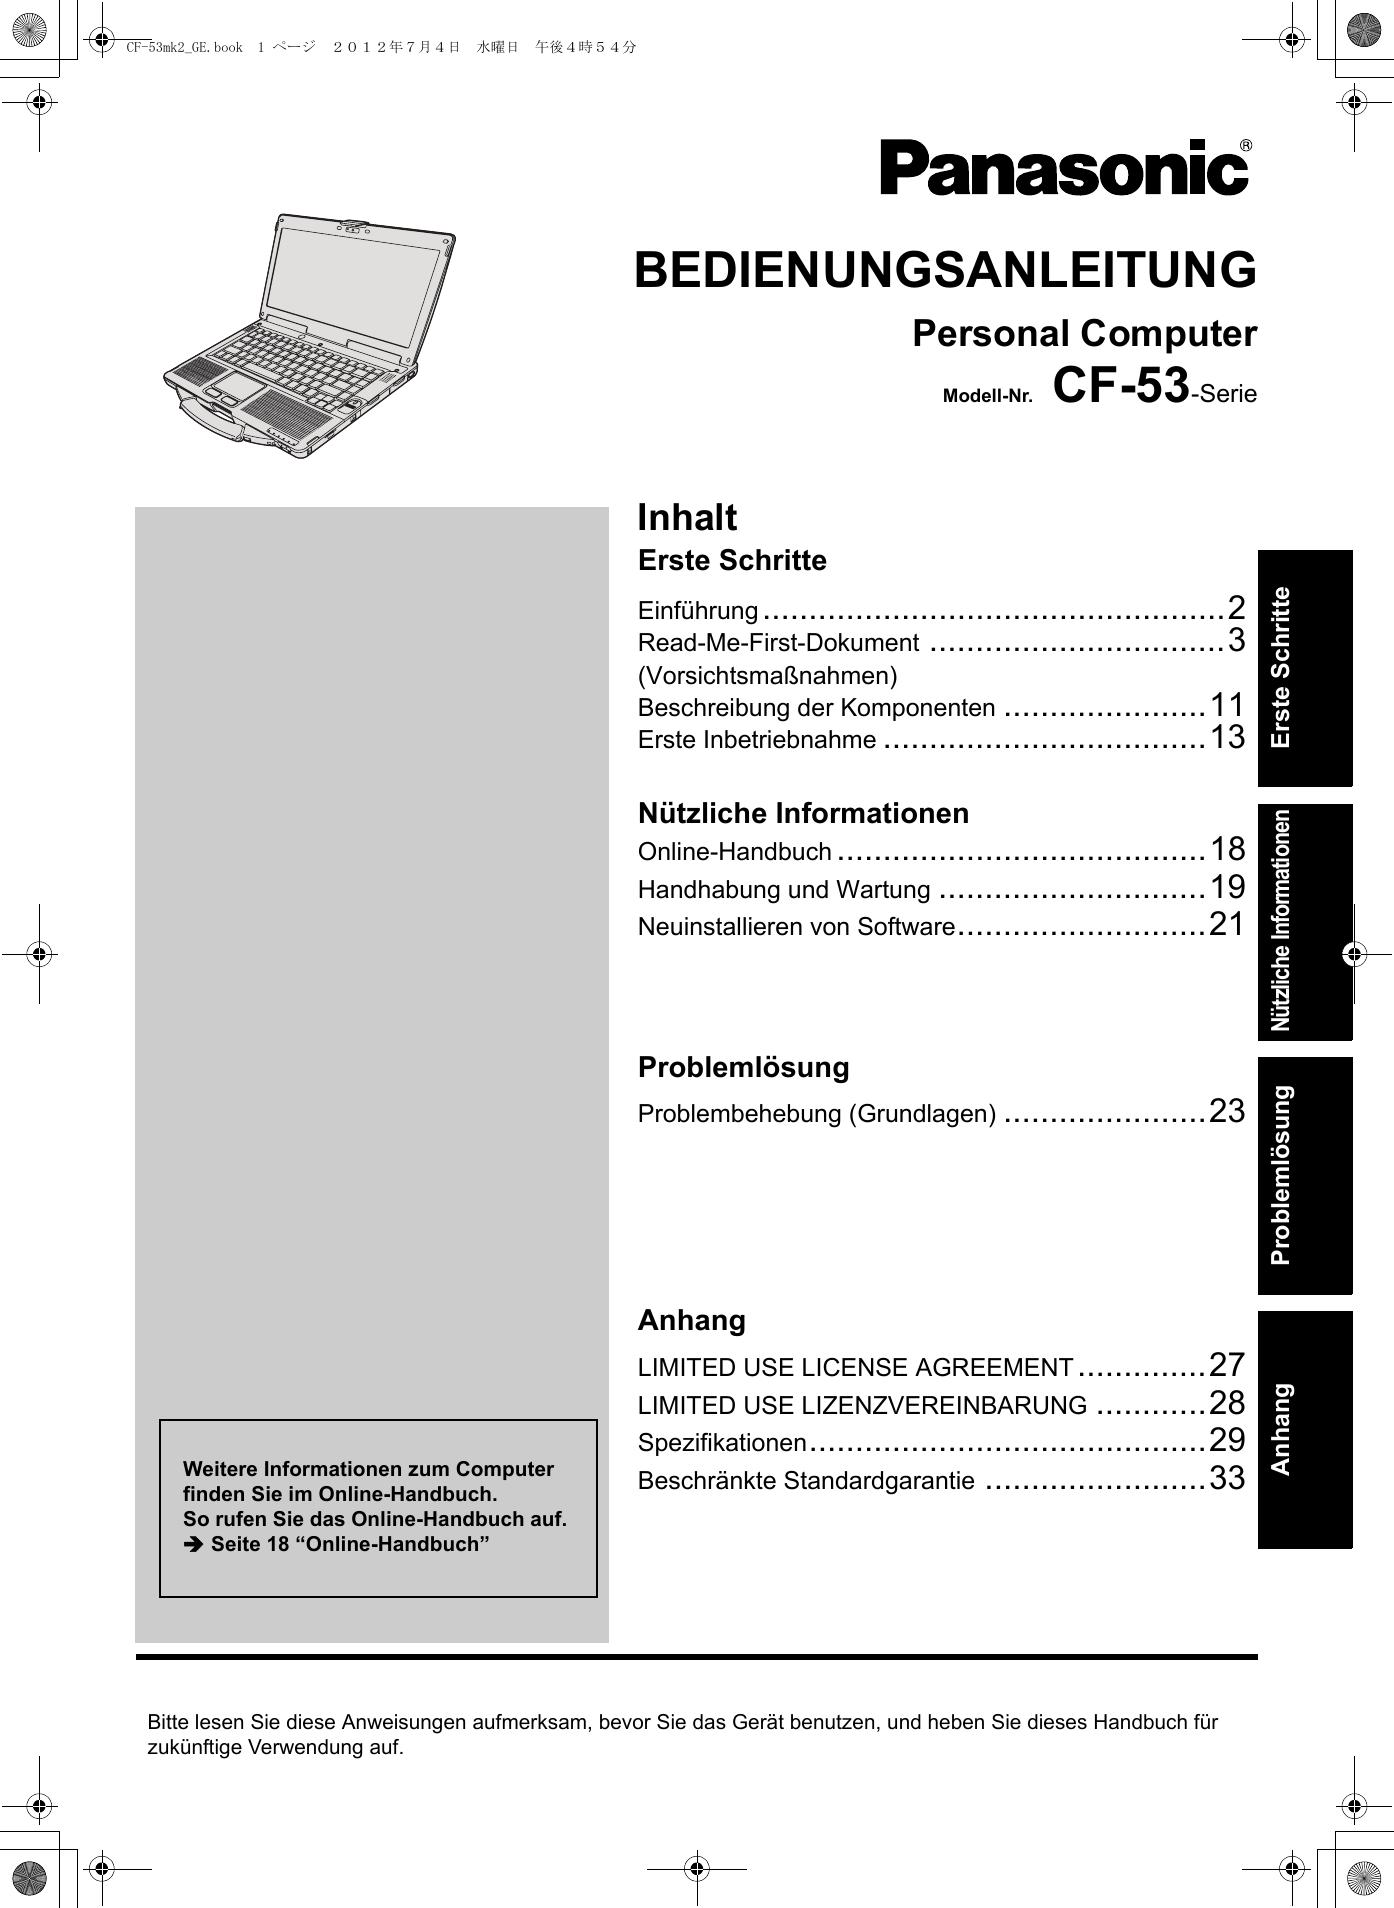 panasonic cf 53j windows 7 pro 53mk2 ge user manual operating instructions  german  53mk2 oi windows 7 professional user manual pdf windows 7 professional manual download